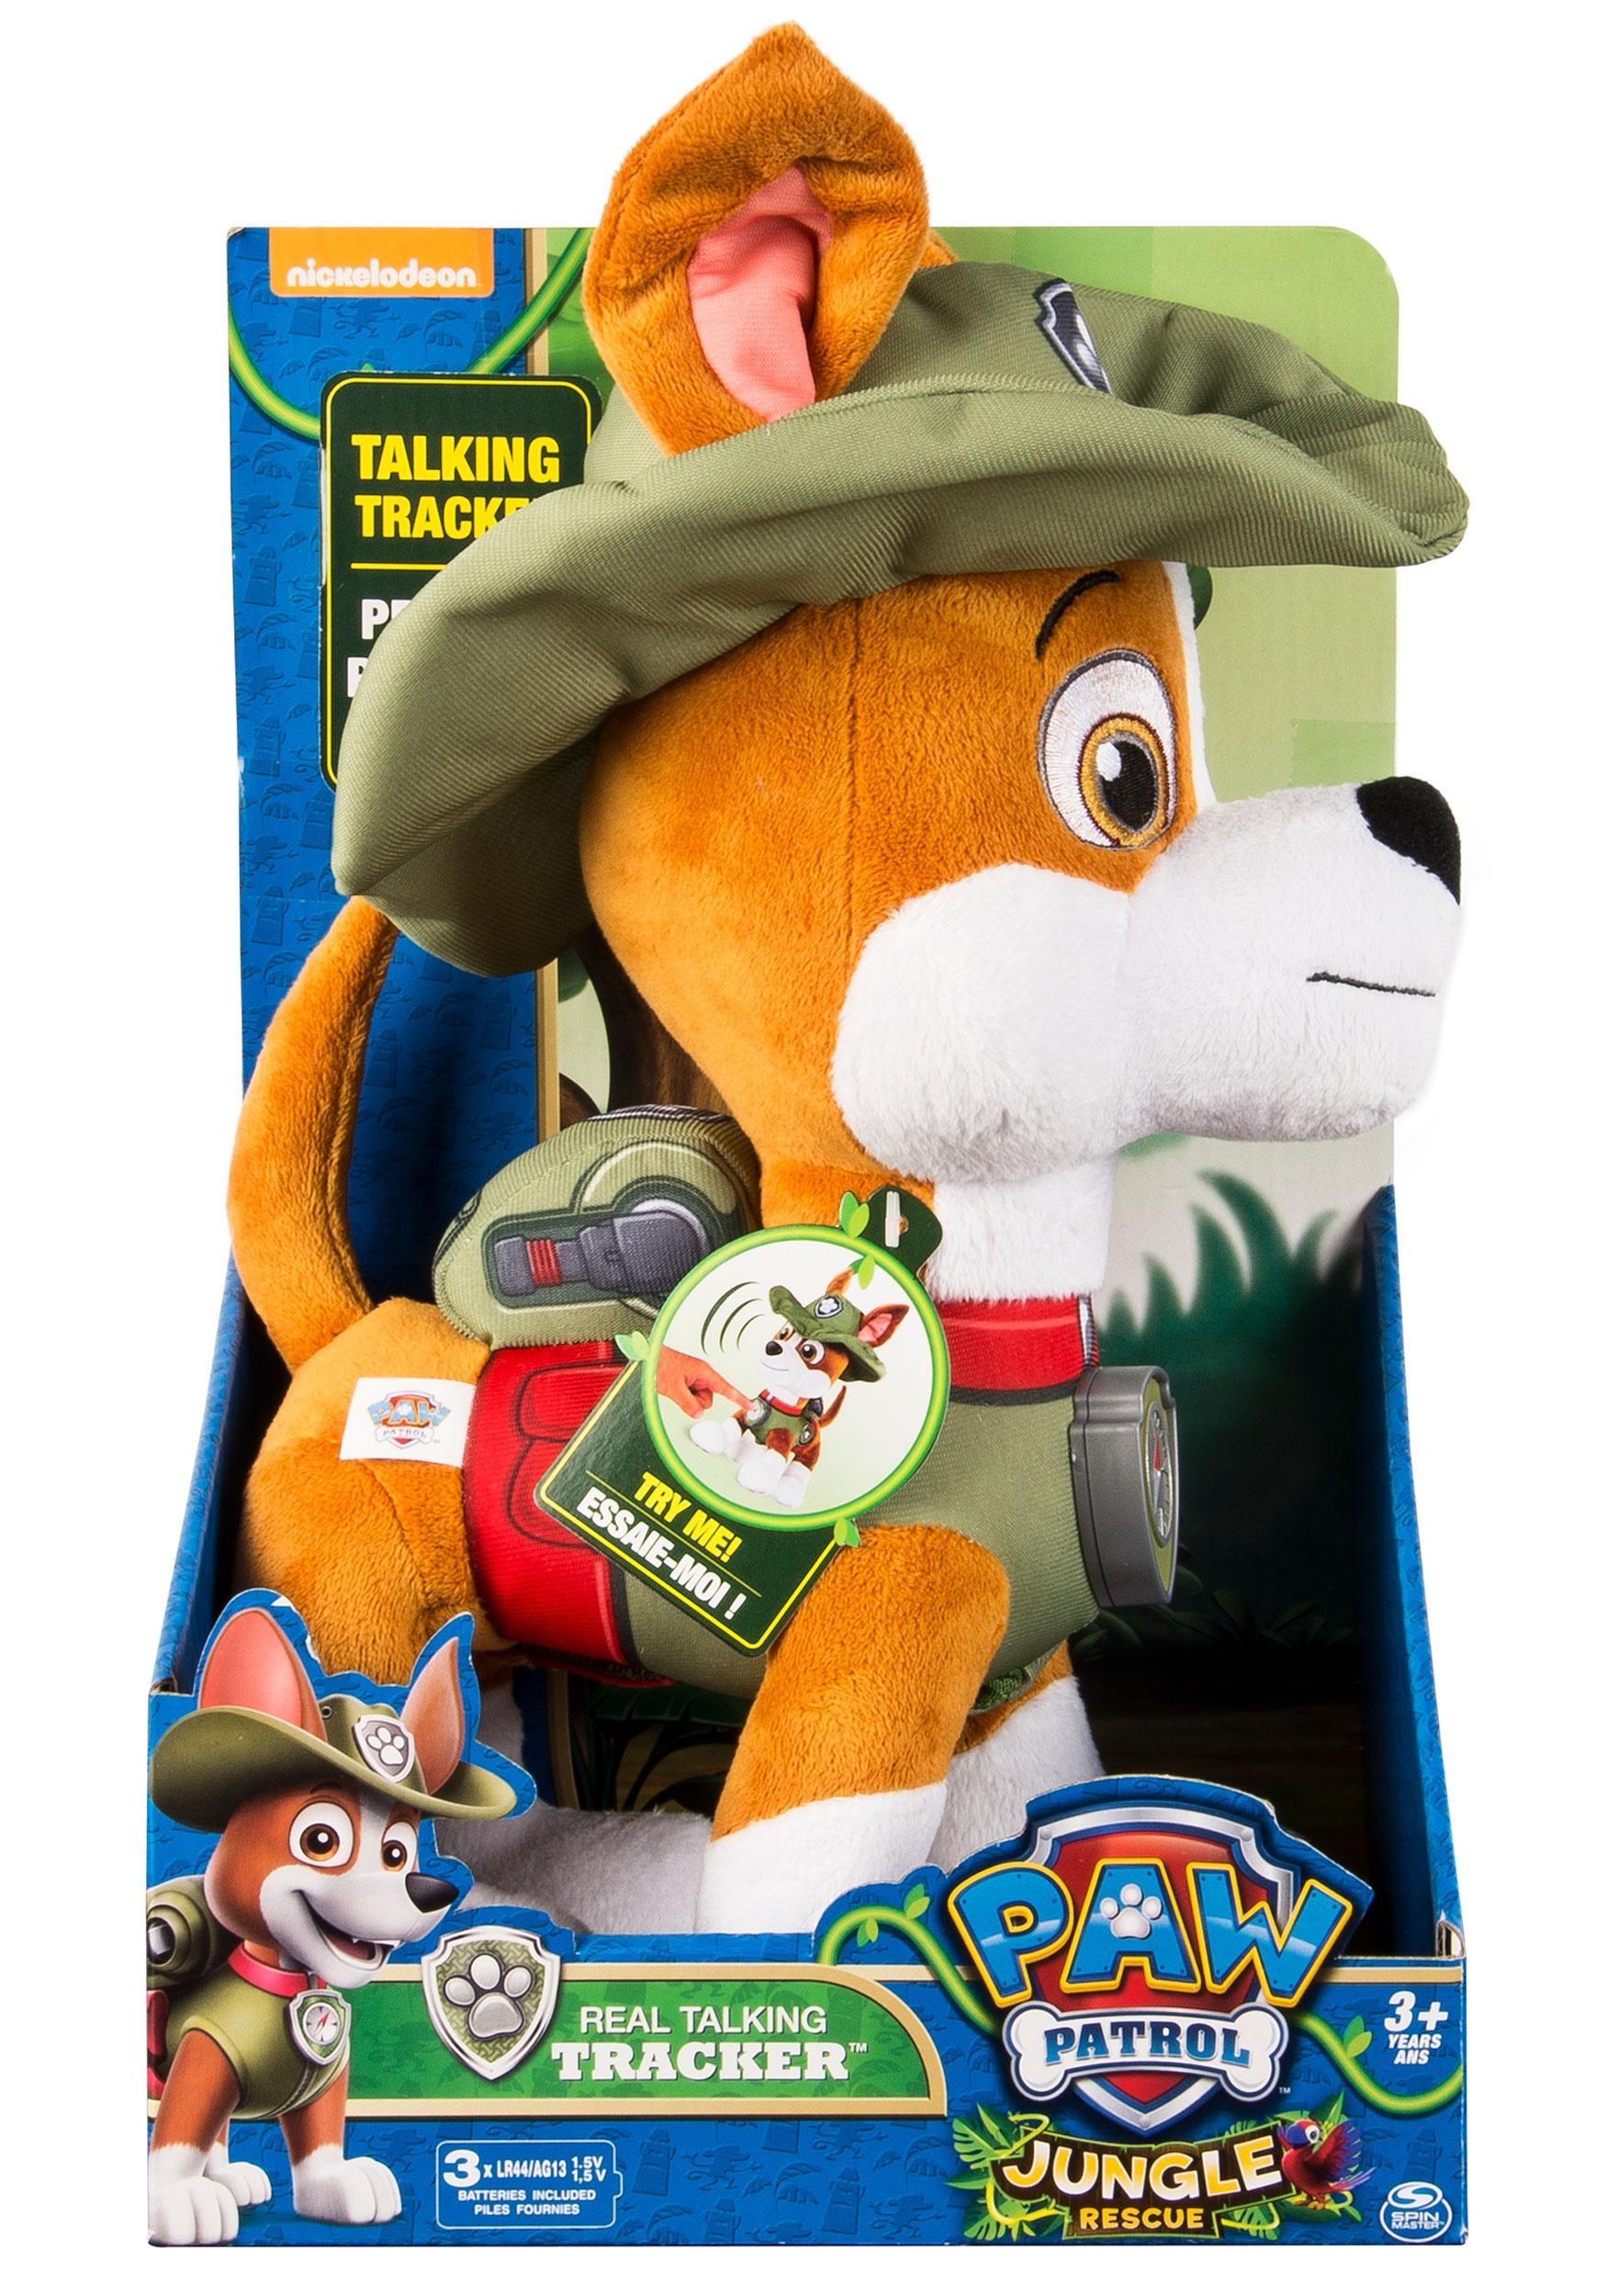 Paw Patrol Tracker Talking Stuffed Toy